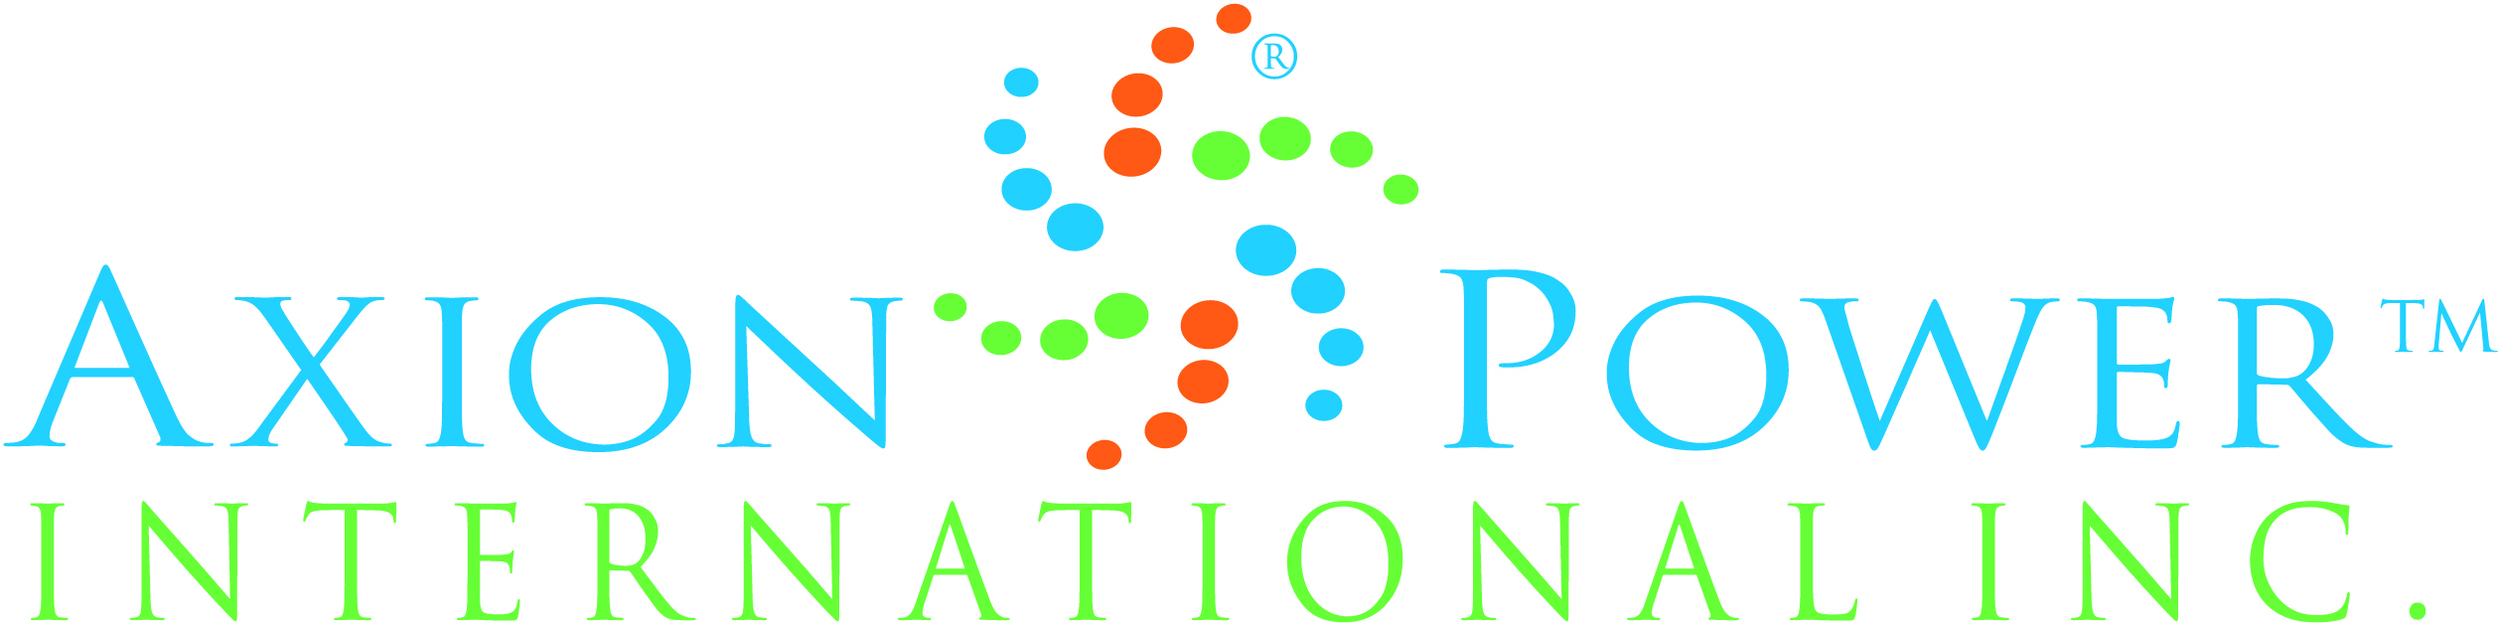 2014 Axion Power Int logo.jpg